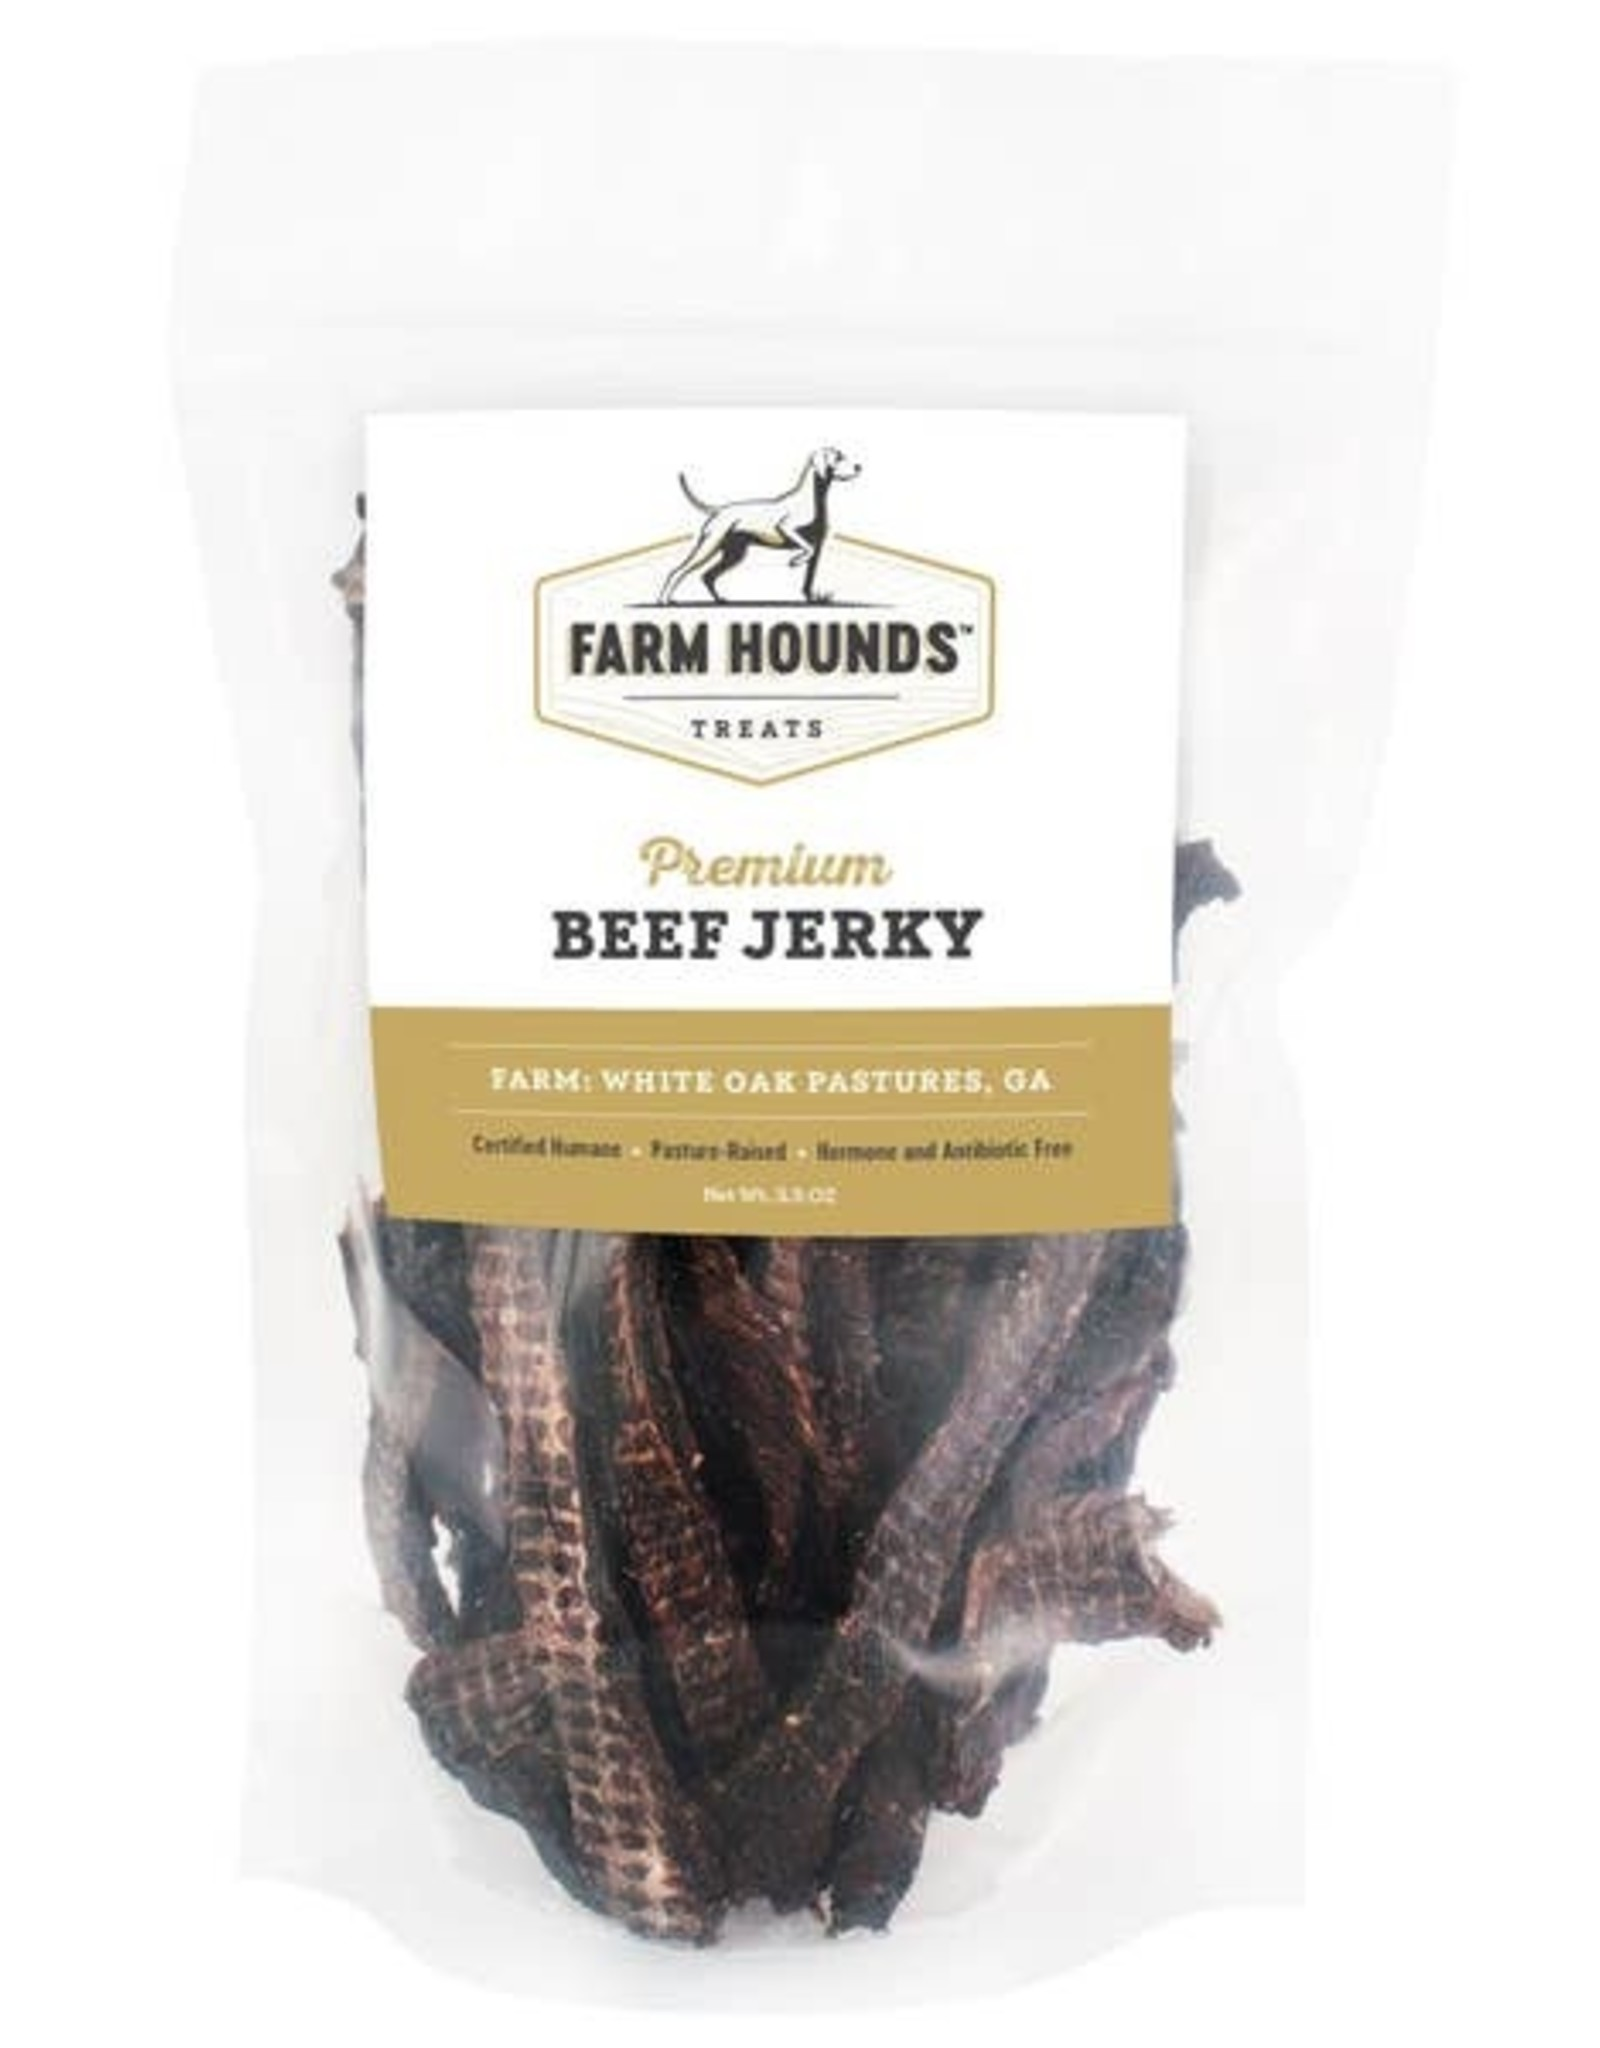 Farm Hounds Beef Jerky - 3.5 oz